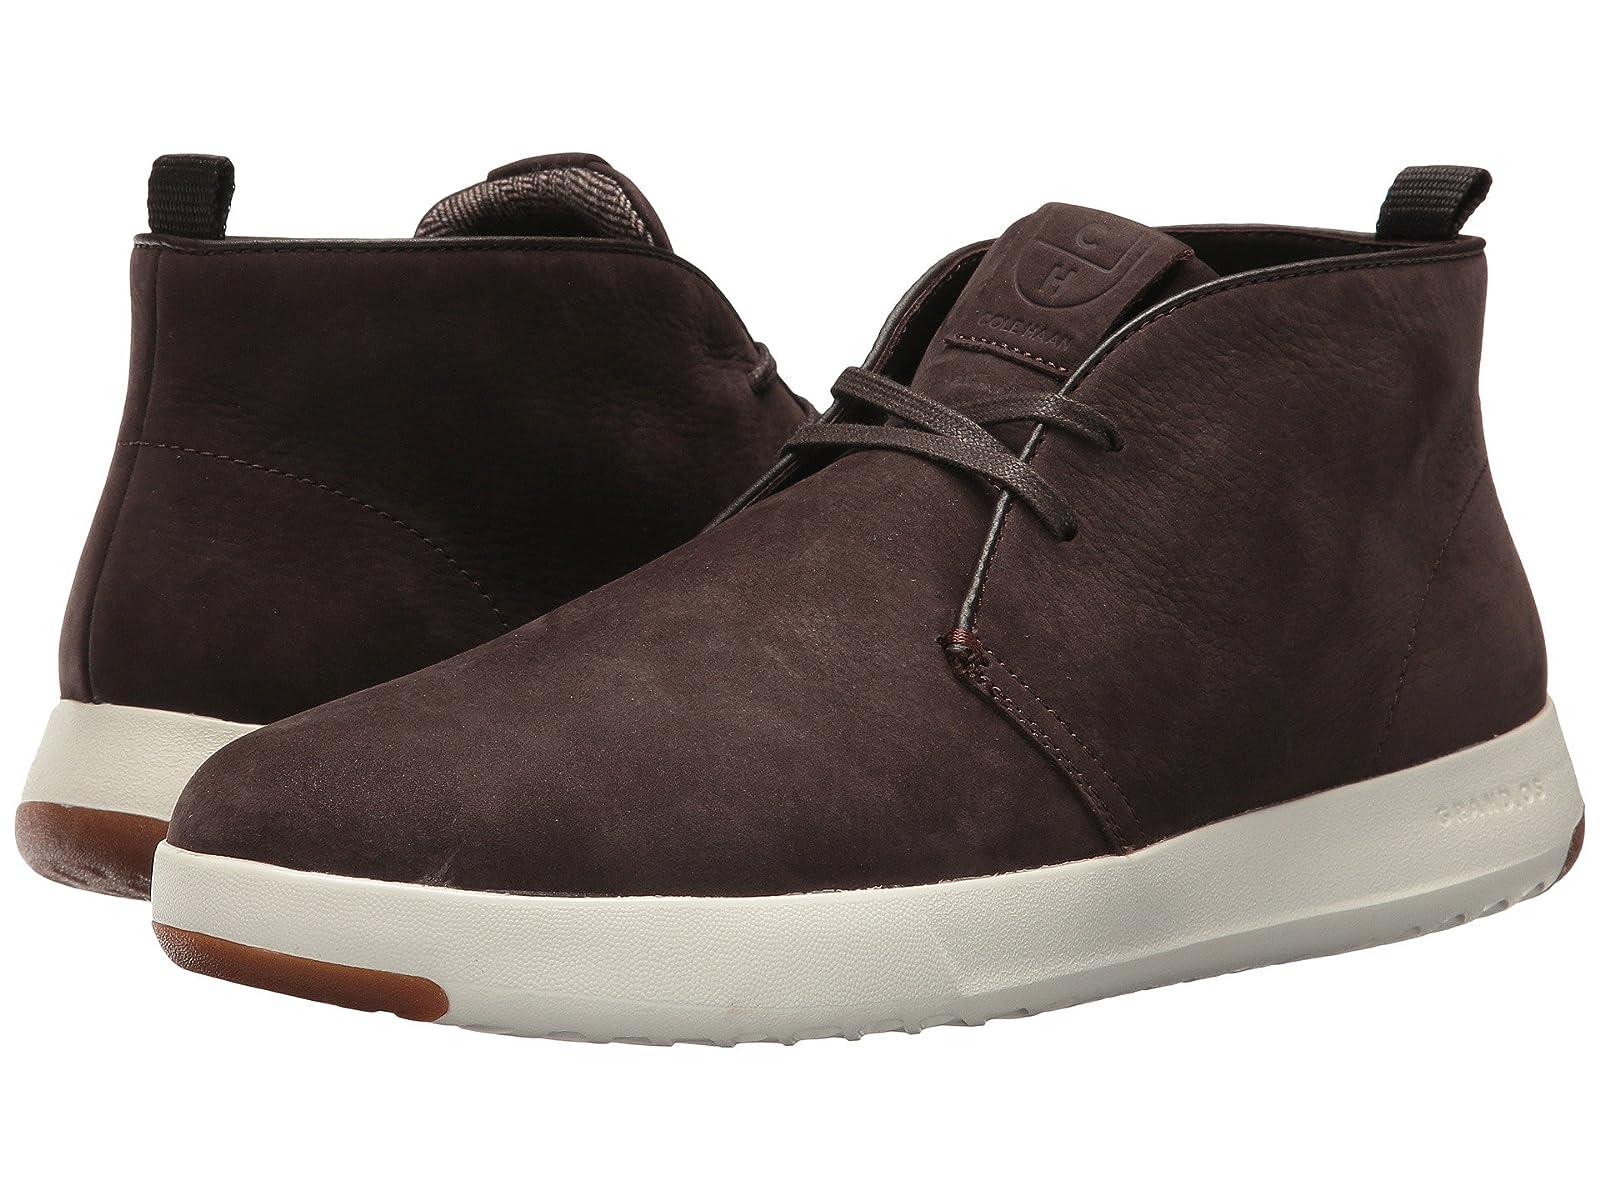 Cole Haan GrandPro ChukkaCheap and distinctive eye-catching shoes